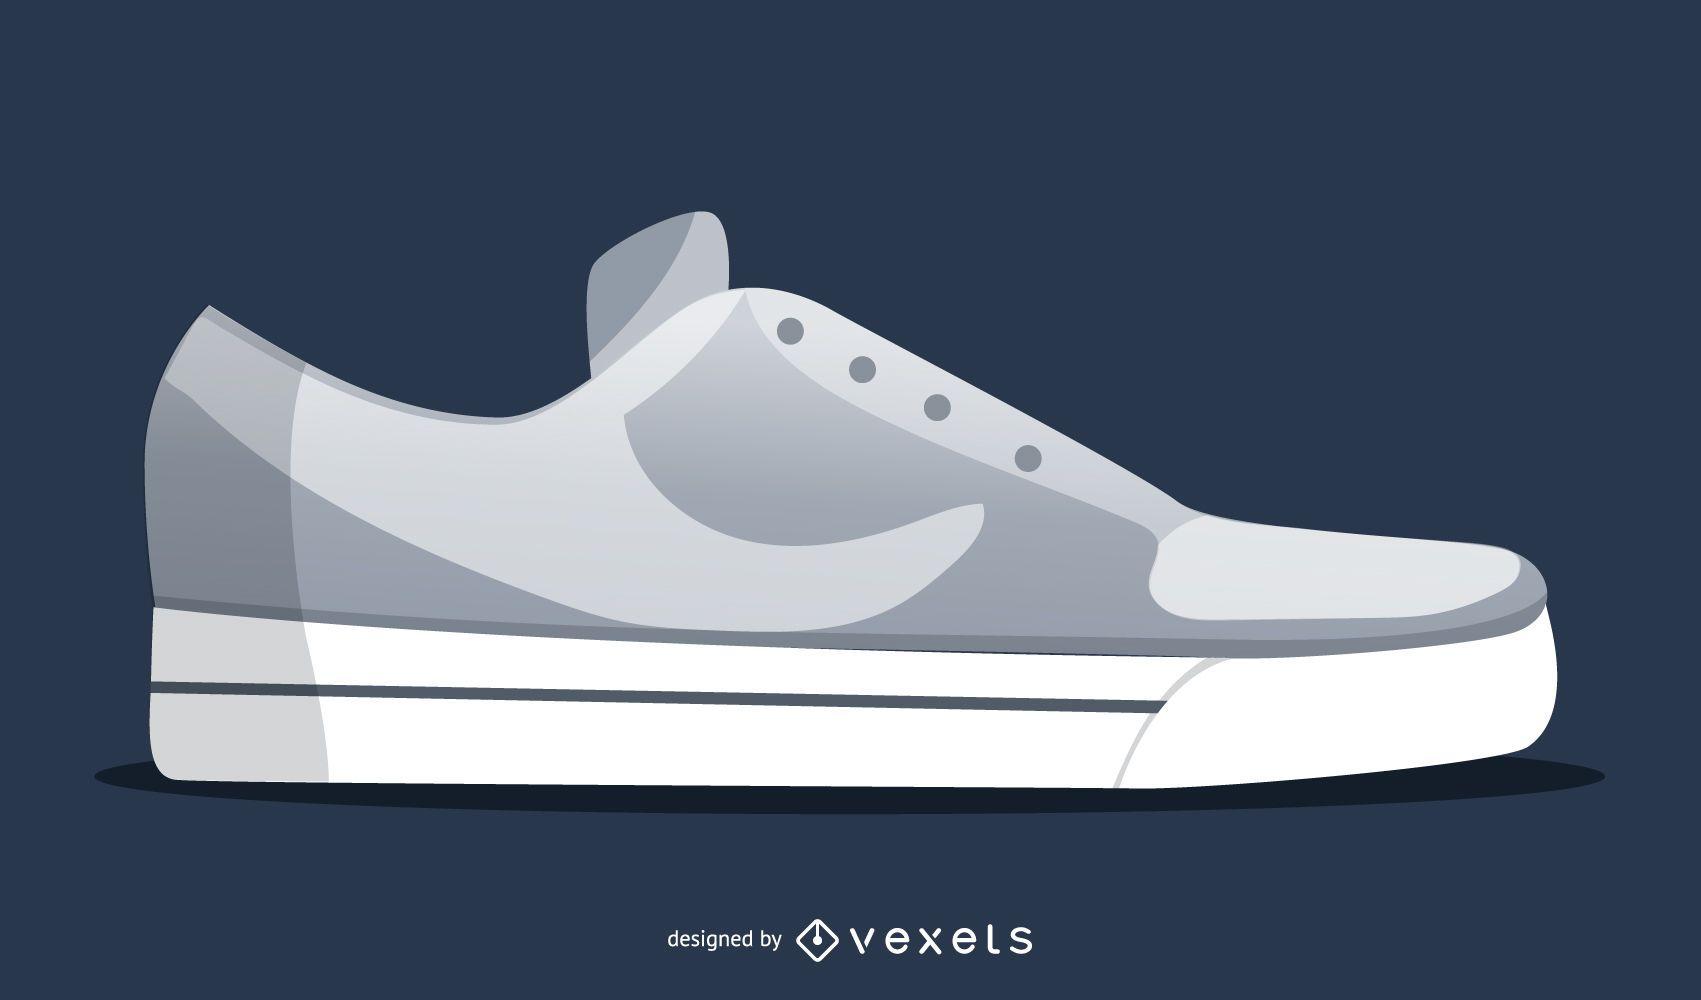 Nike Air Shoes Vector